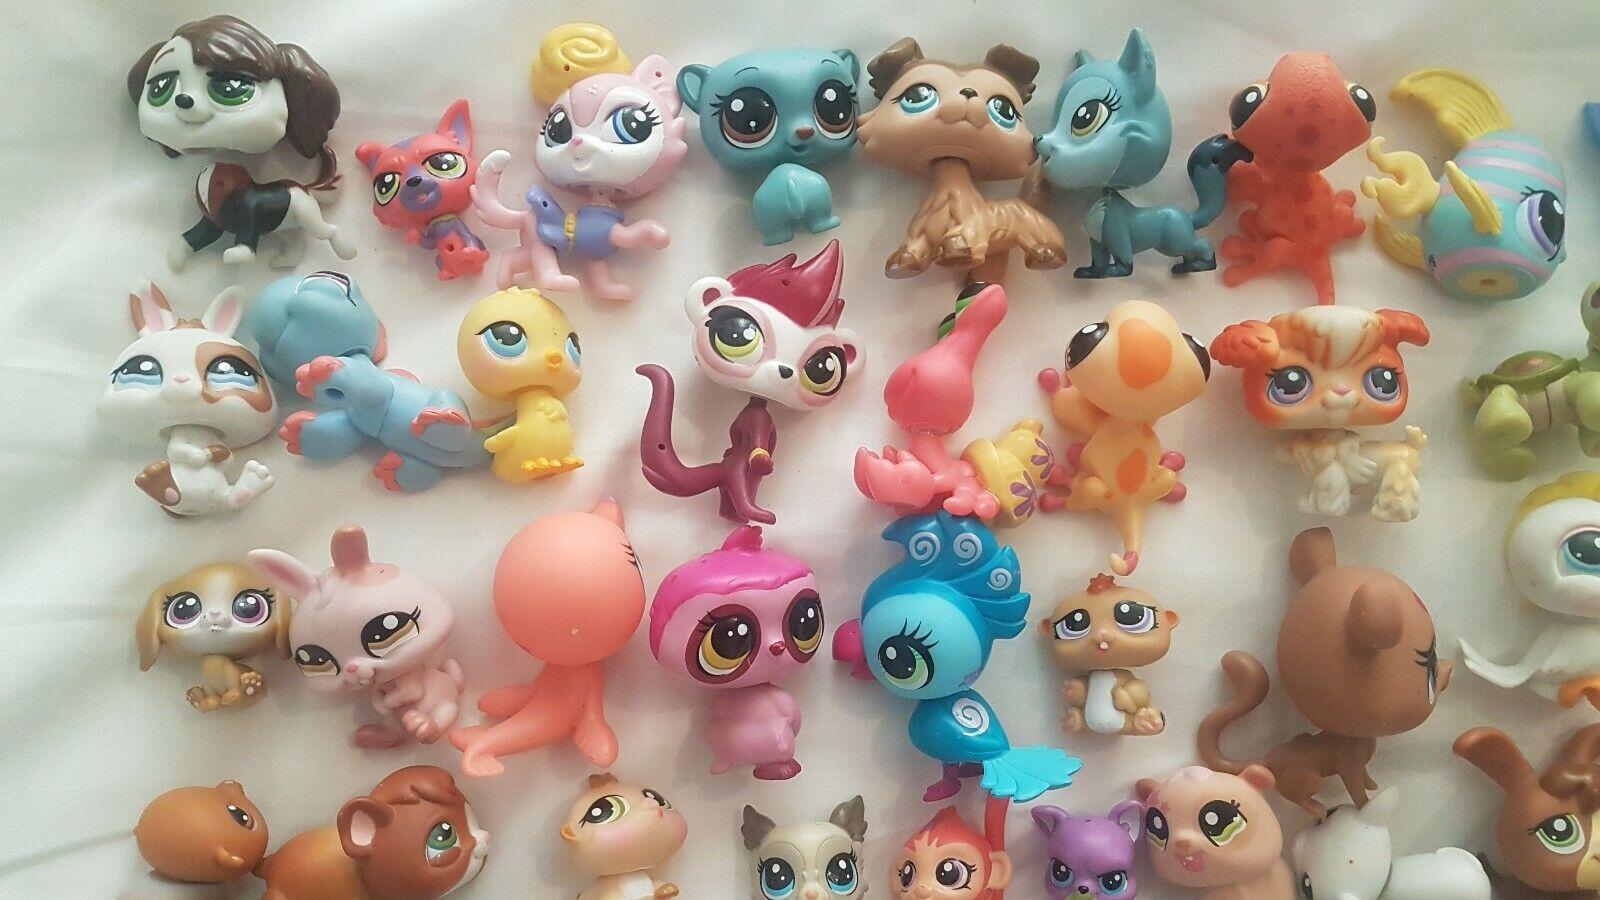 Littlest pet shop bundle 52 figures figures figures cute animals df3